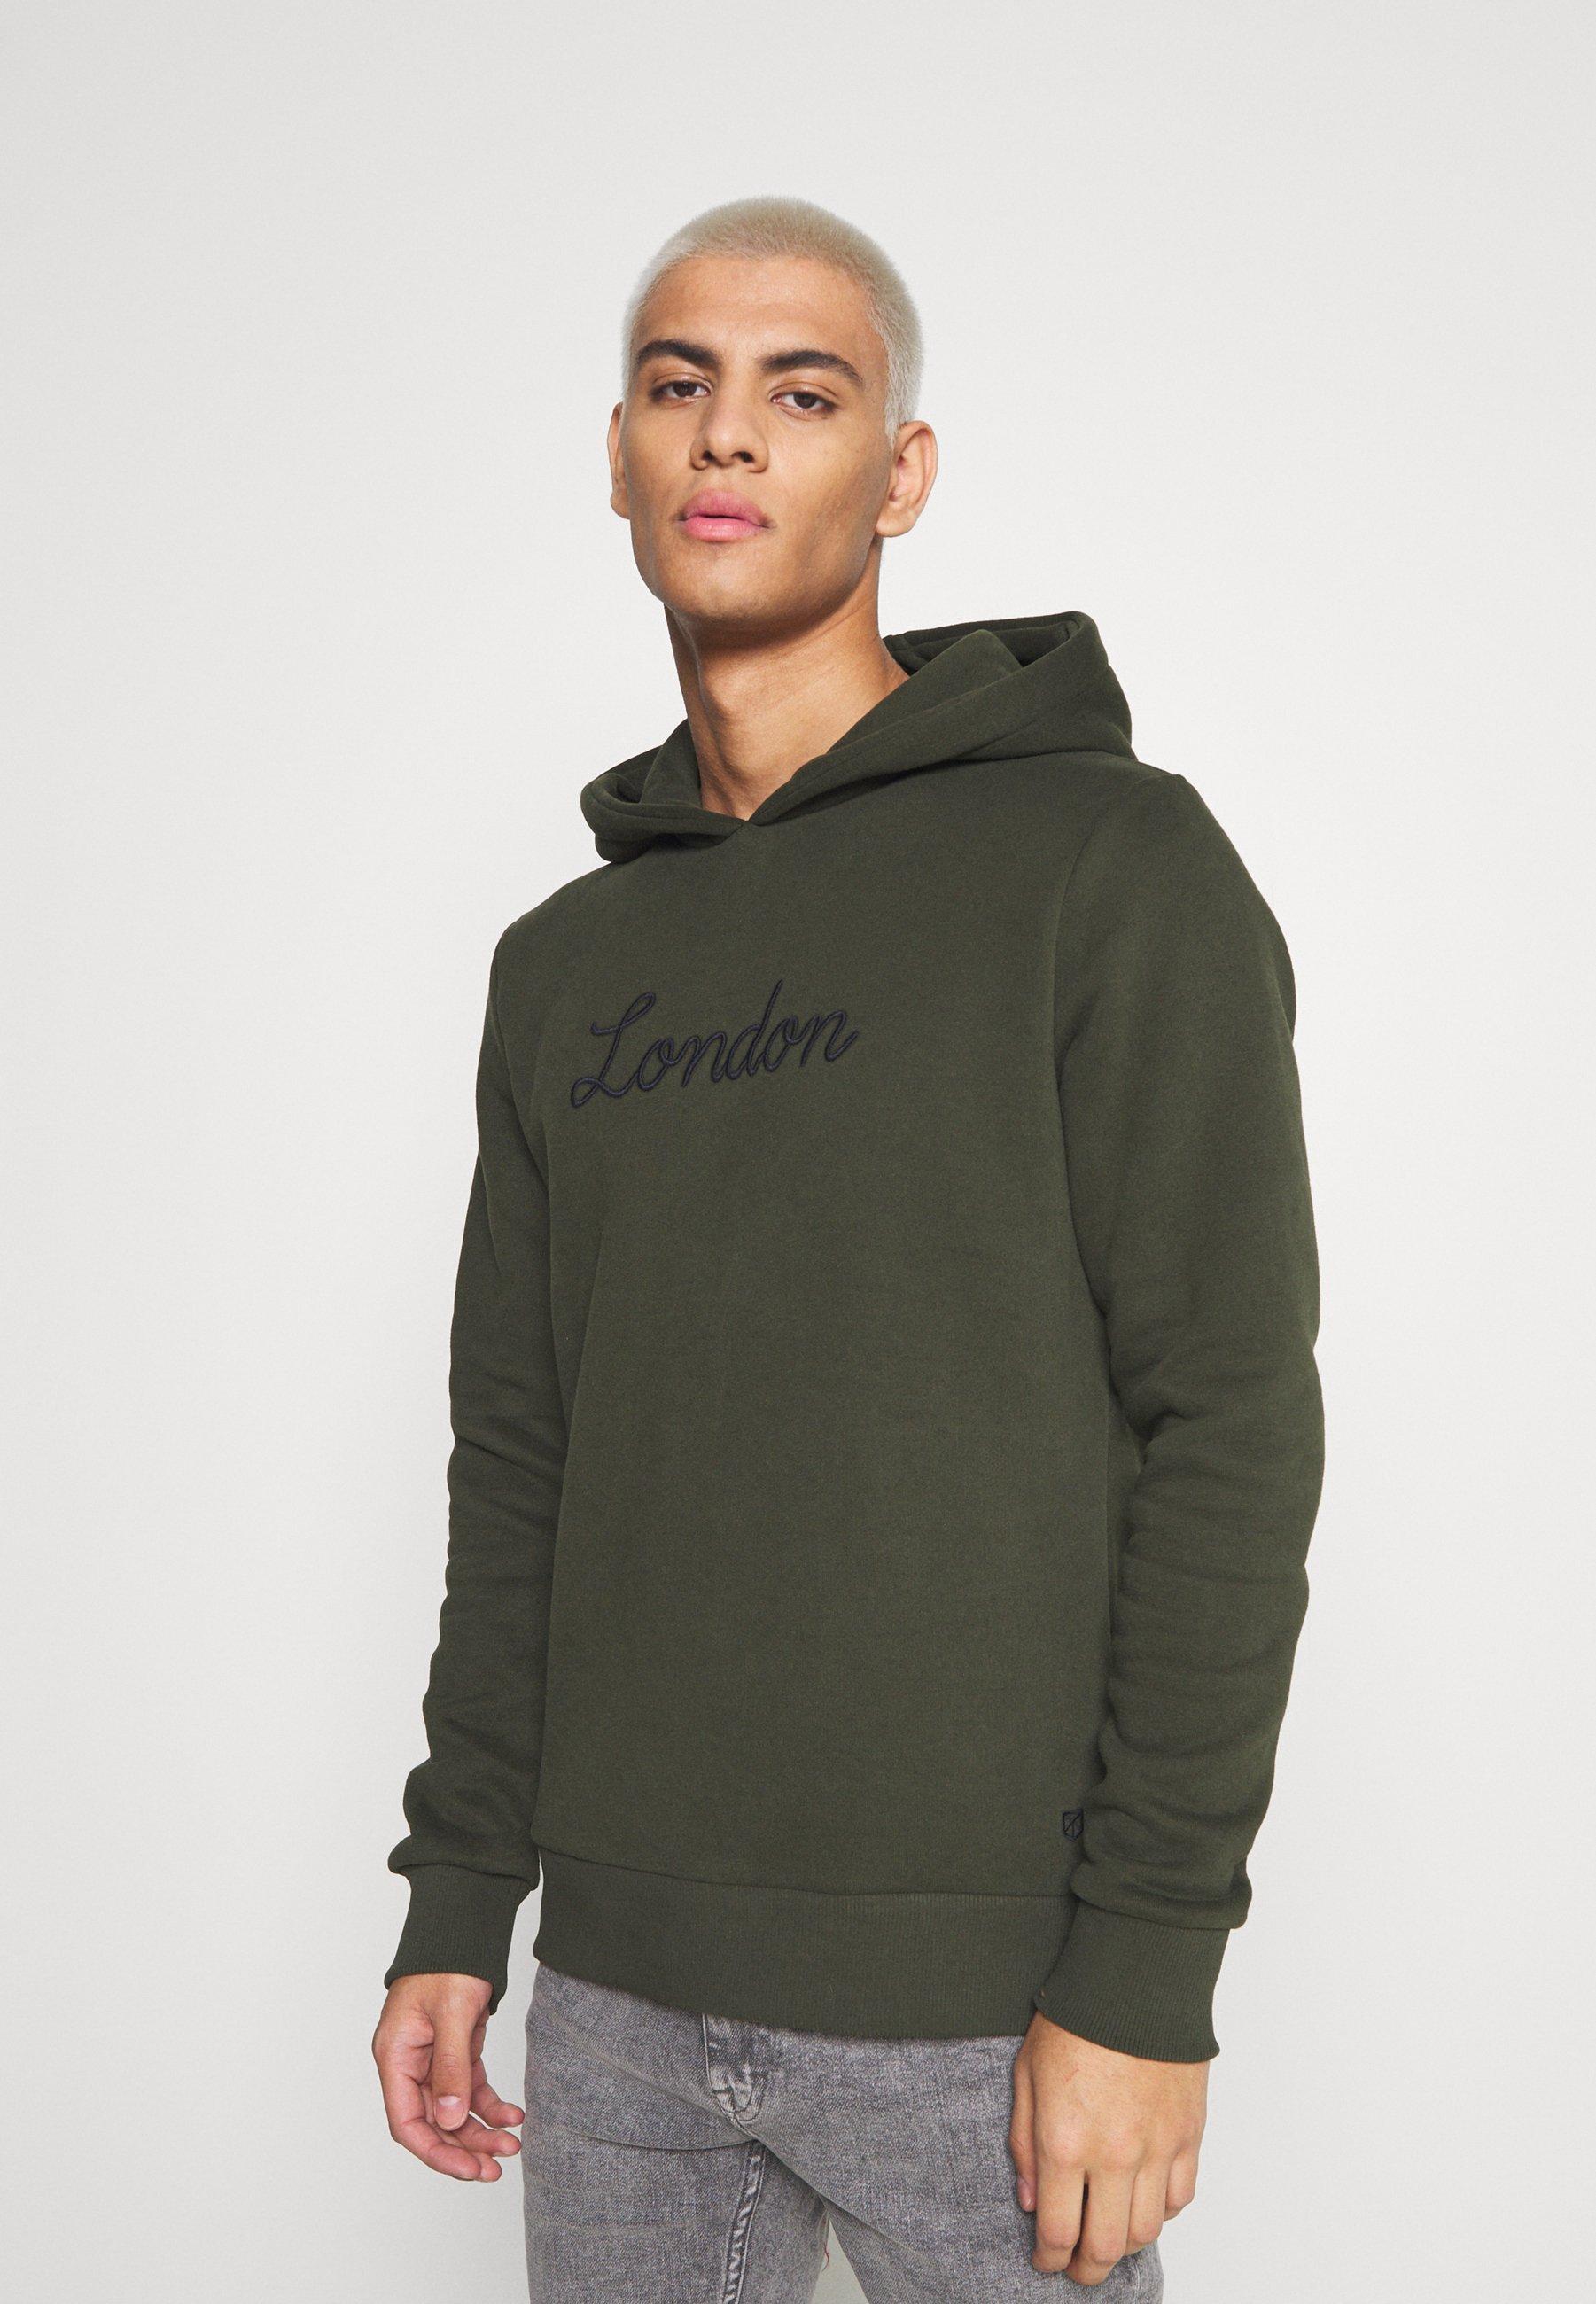 Homme JPRBLAROSCOE HOOD - Sweatshirt